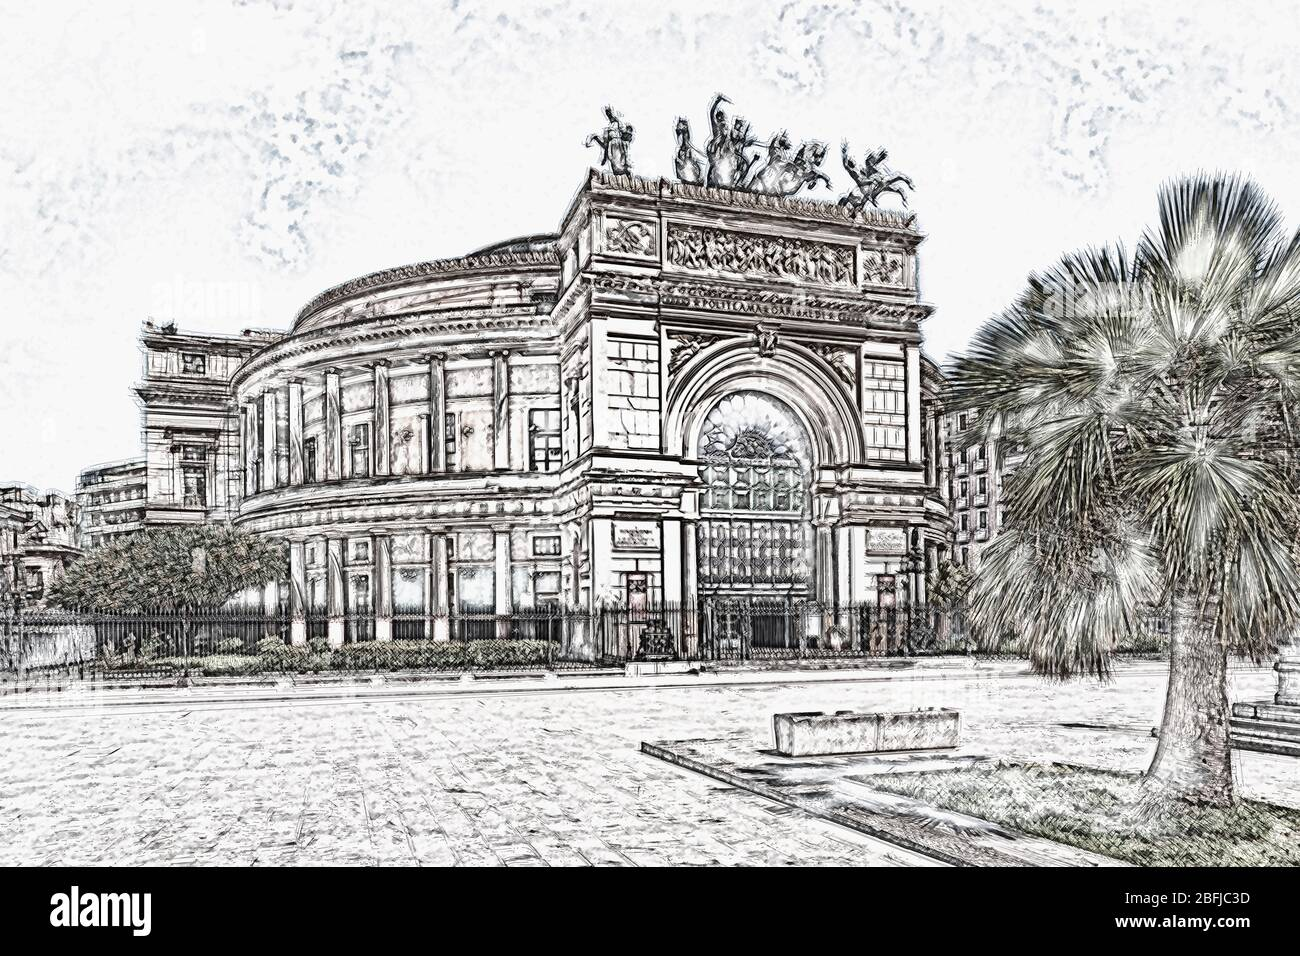 The Teatro Politeama or Teatro Politeama Garibaldi is a theater building in Palermo, Sicily, Italy, Europe Stock Photo